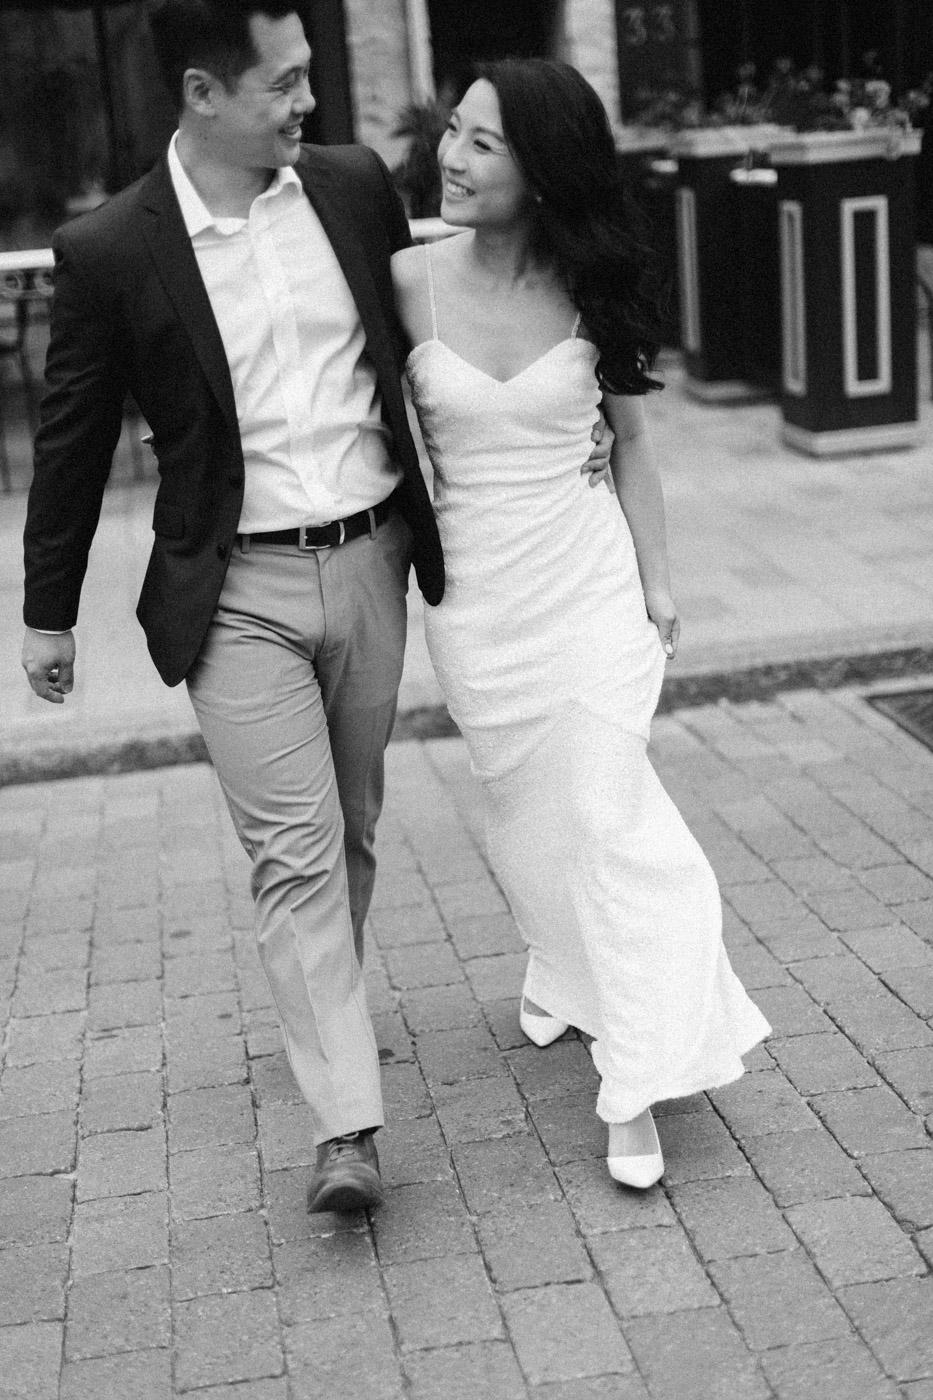 toronto_wedding_photographer_fine_art_documentary 2017-86.jpg